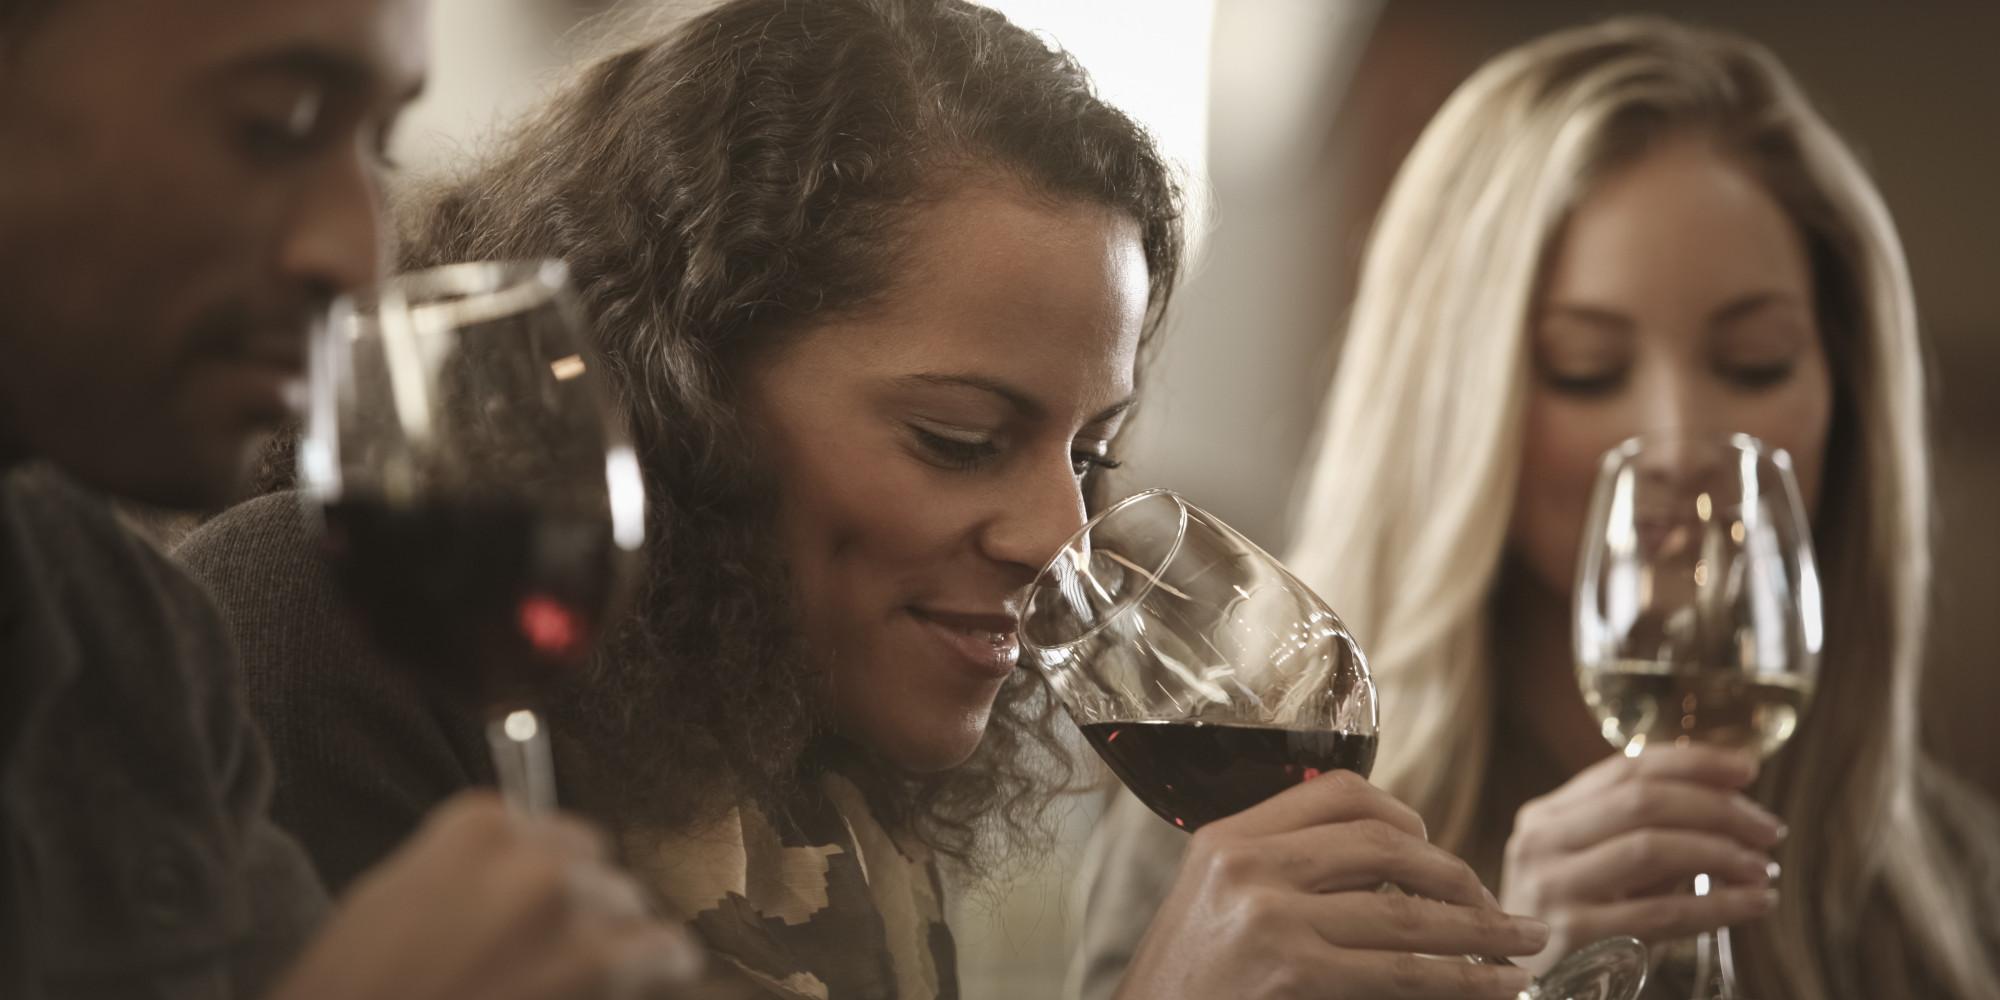 wine tasting - smell